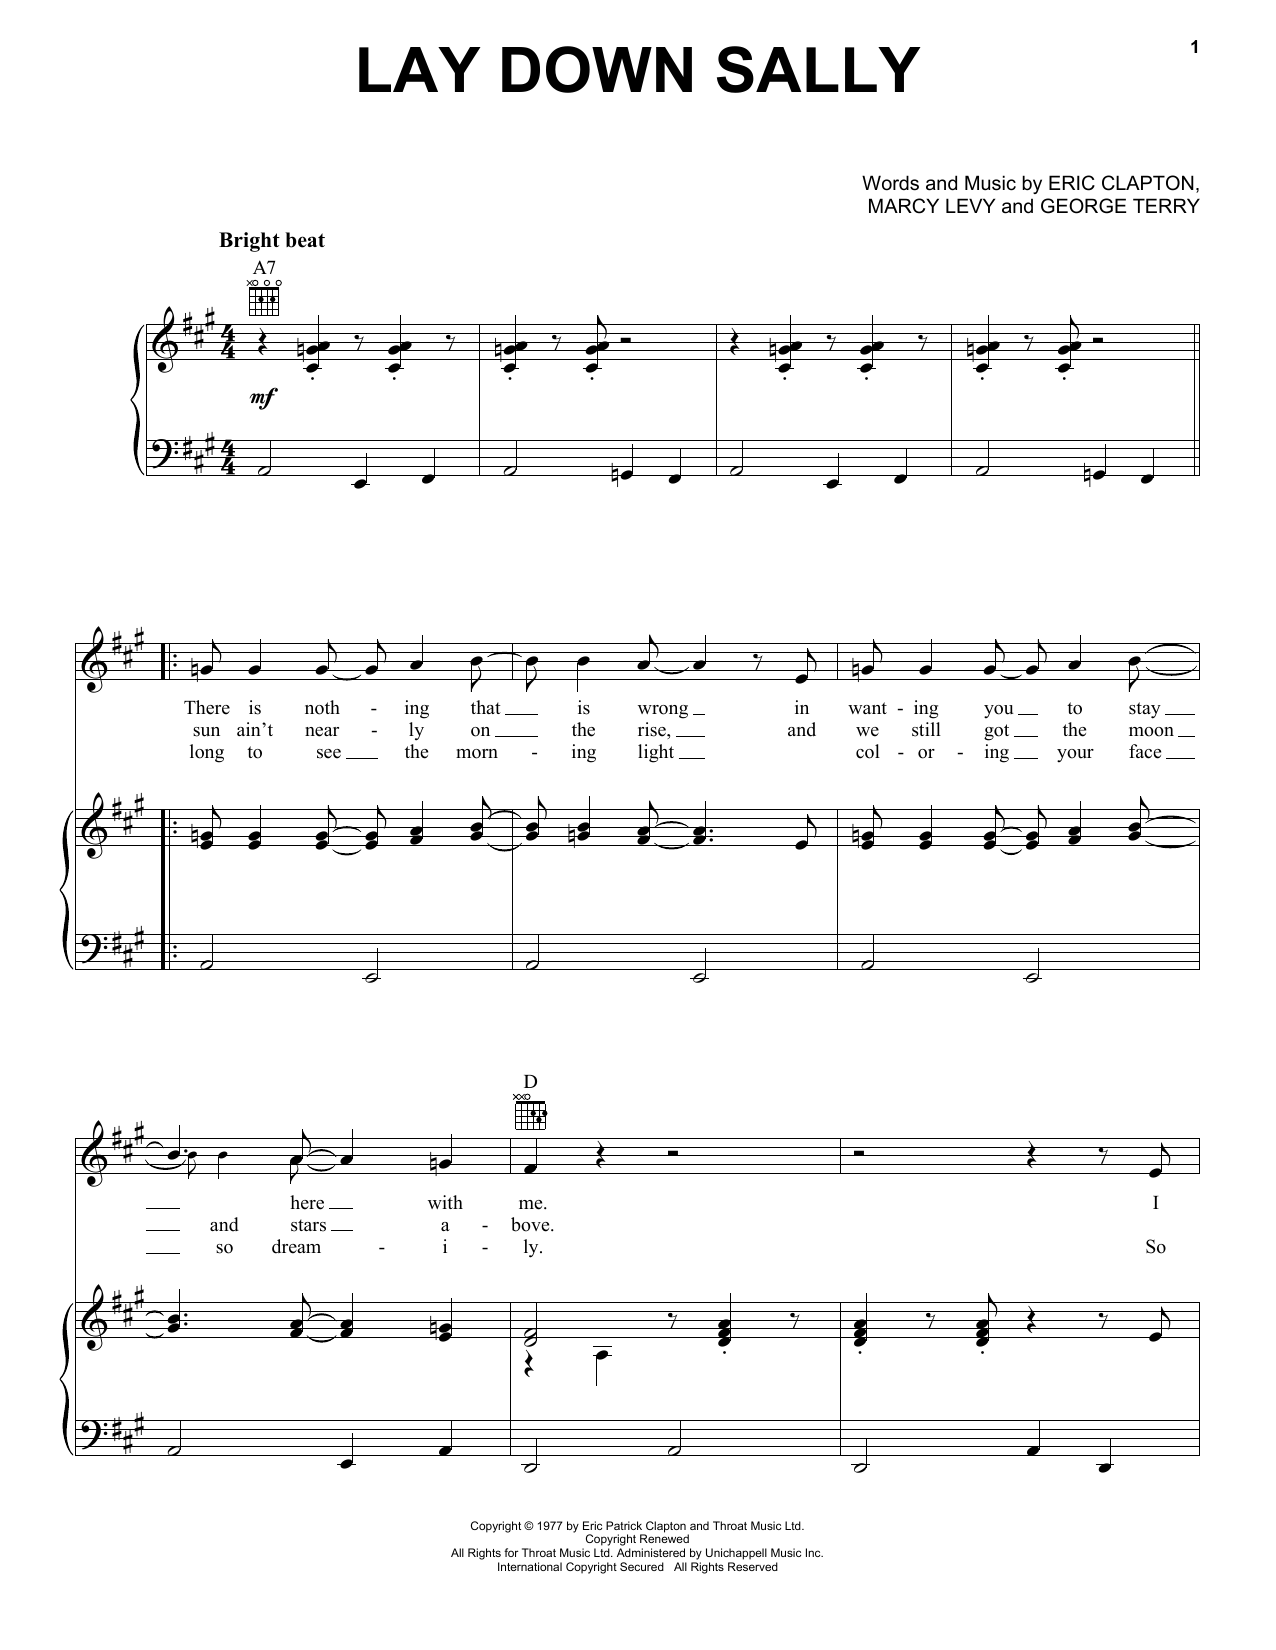 Lay Down Sally sheet music